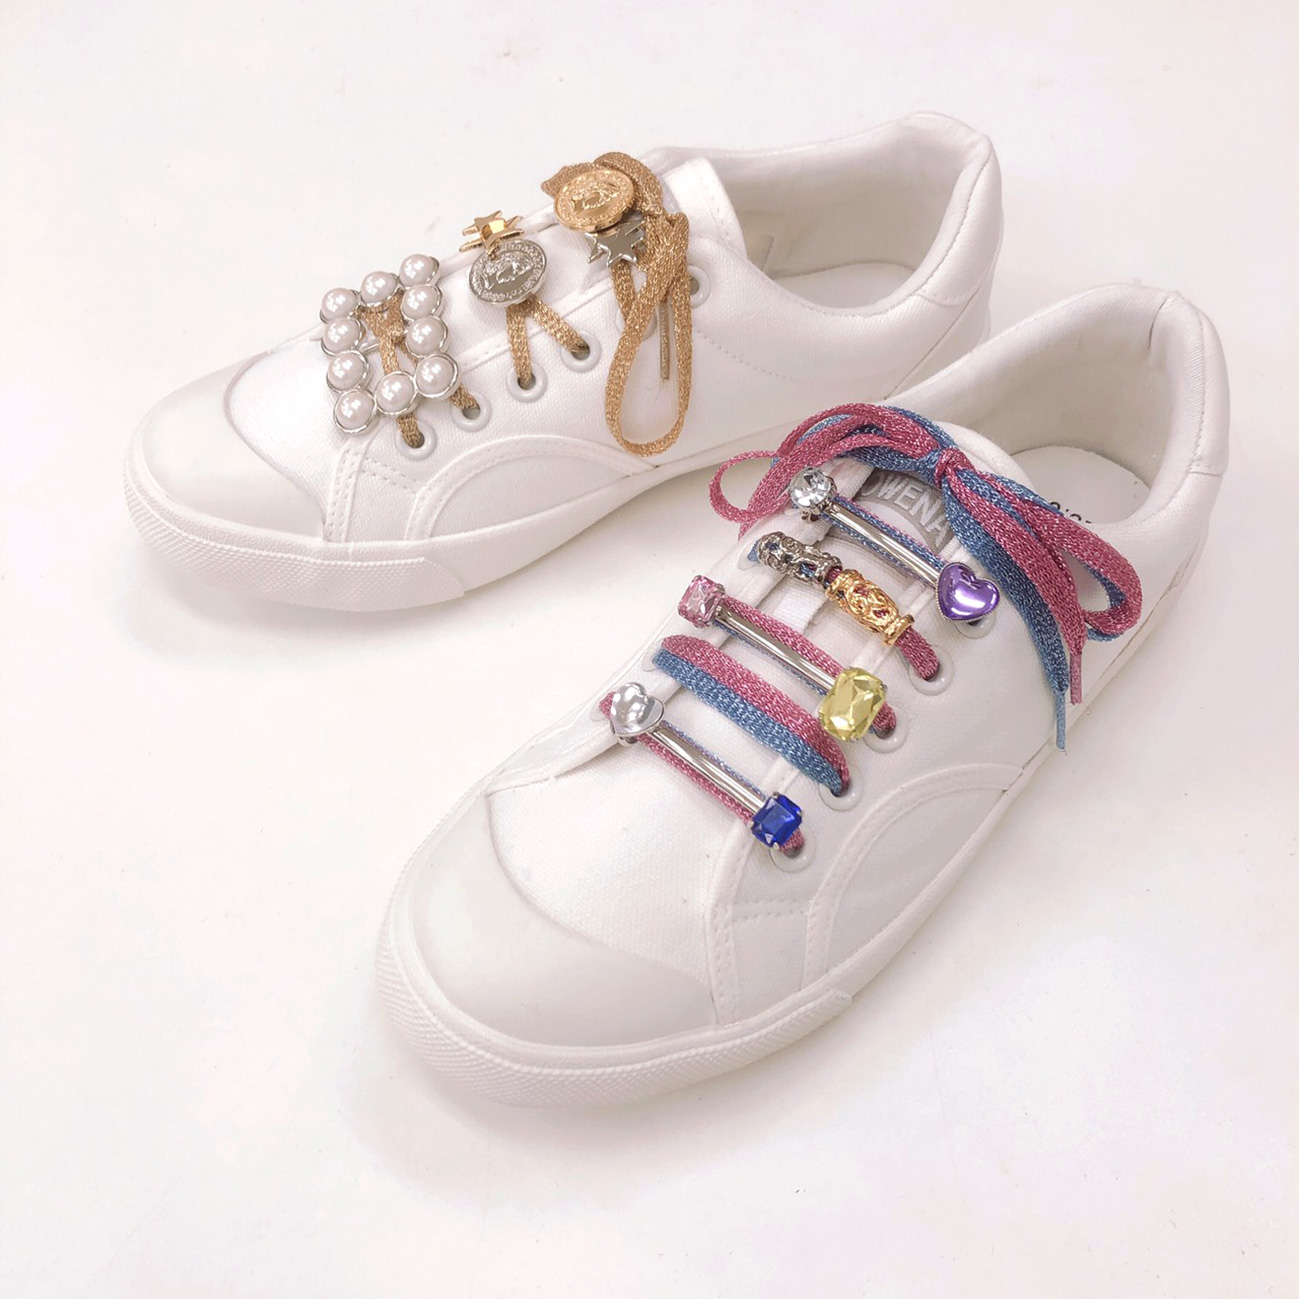 Shoe pierce sneaker accessory bijou シューピアス ビジュー ハート スニーカー アクセサリー ジュエリー